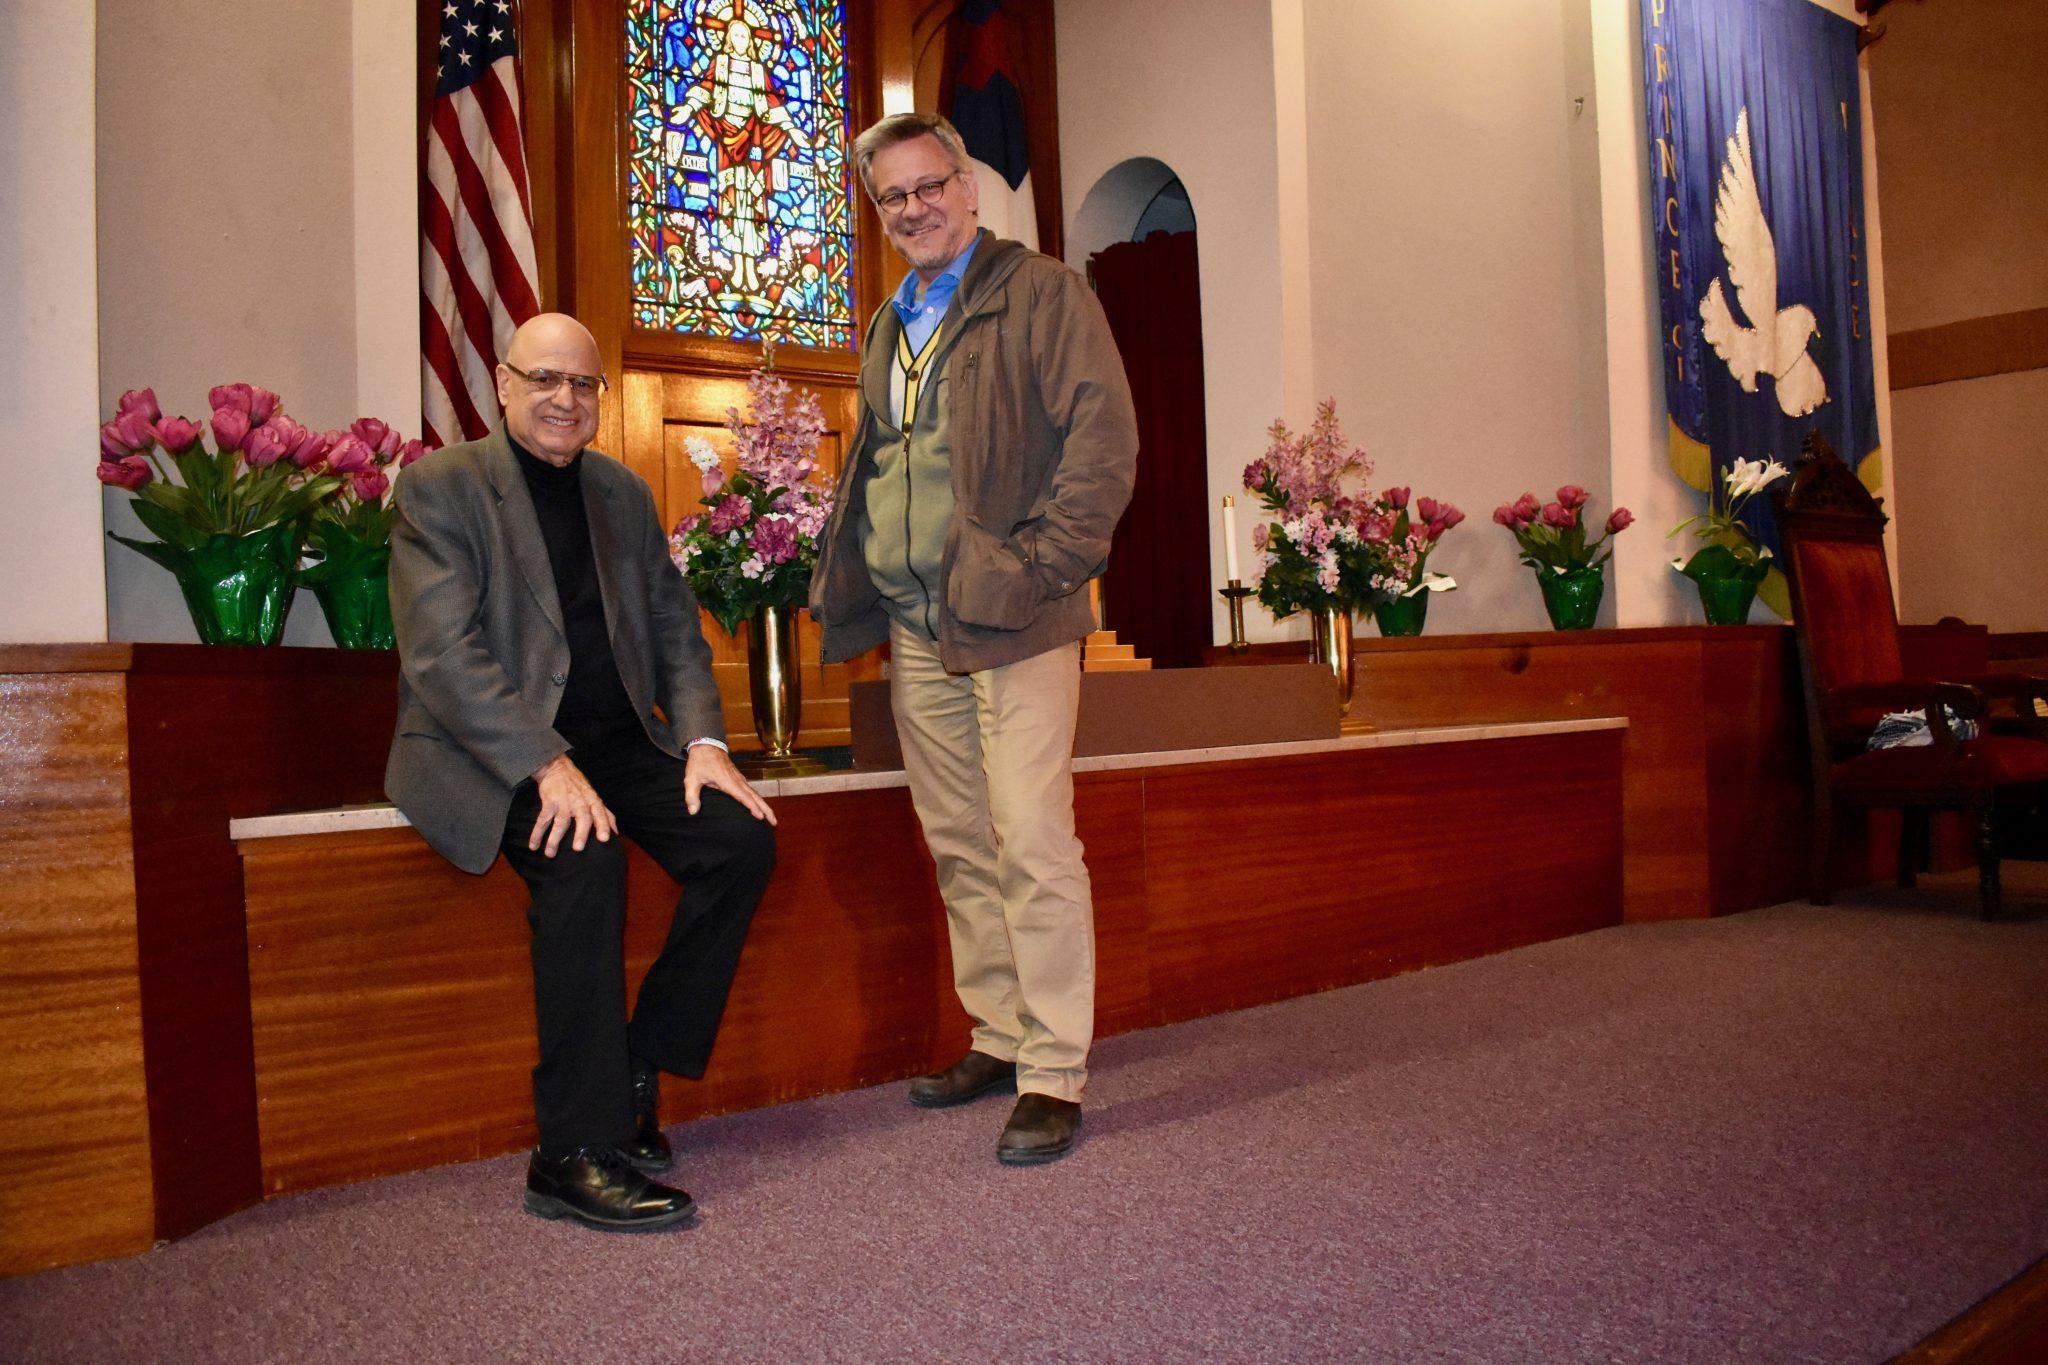 National spiritual leader Tony Campolo and fellow Eastern University professor serve as new co-pastors of St. John's